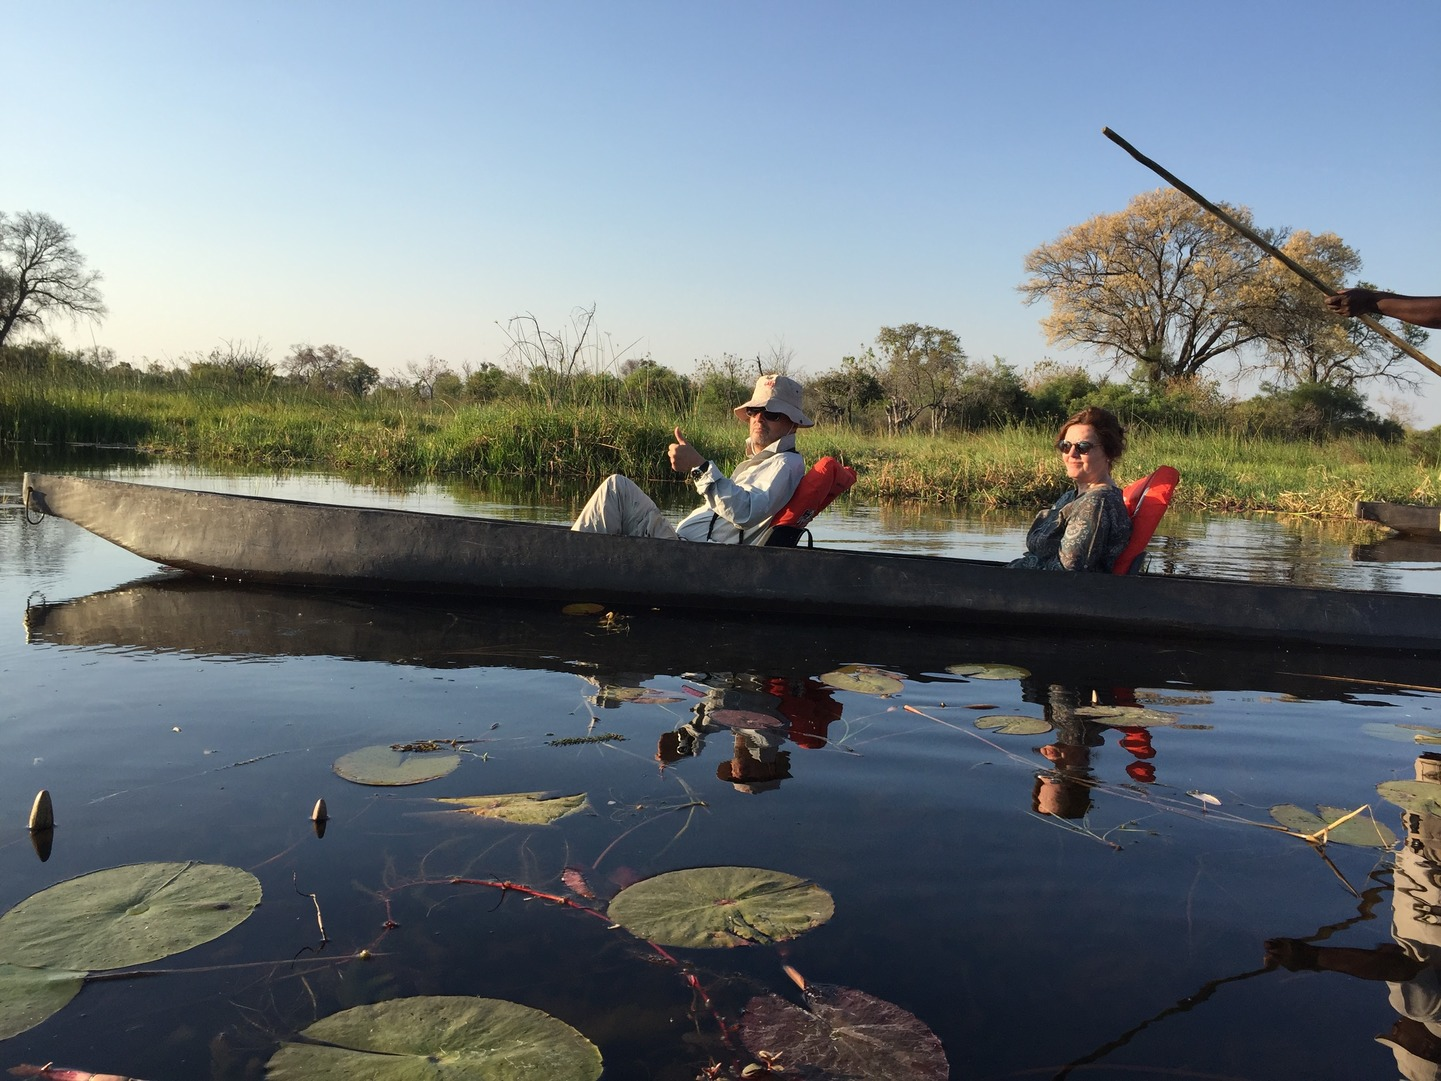 Zimbawe: Tras los pasos de Livingstone